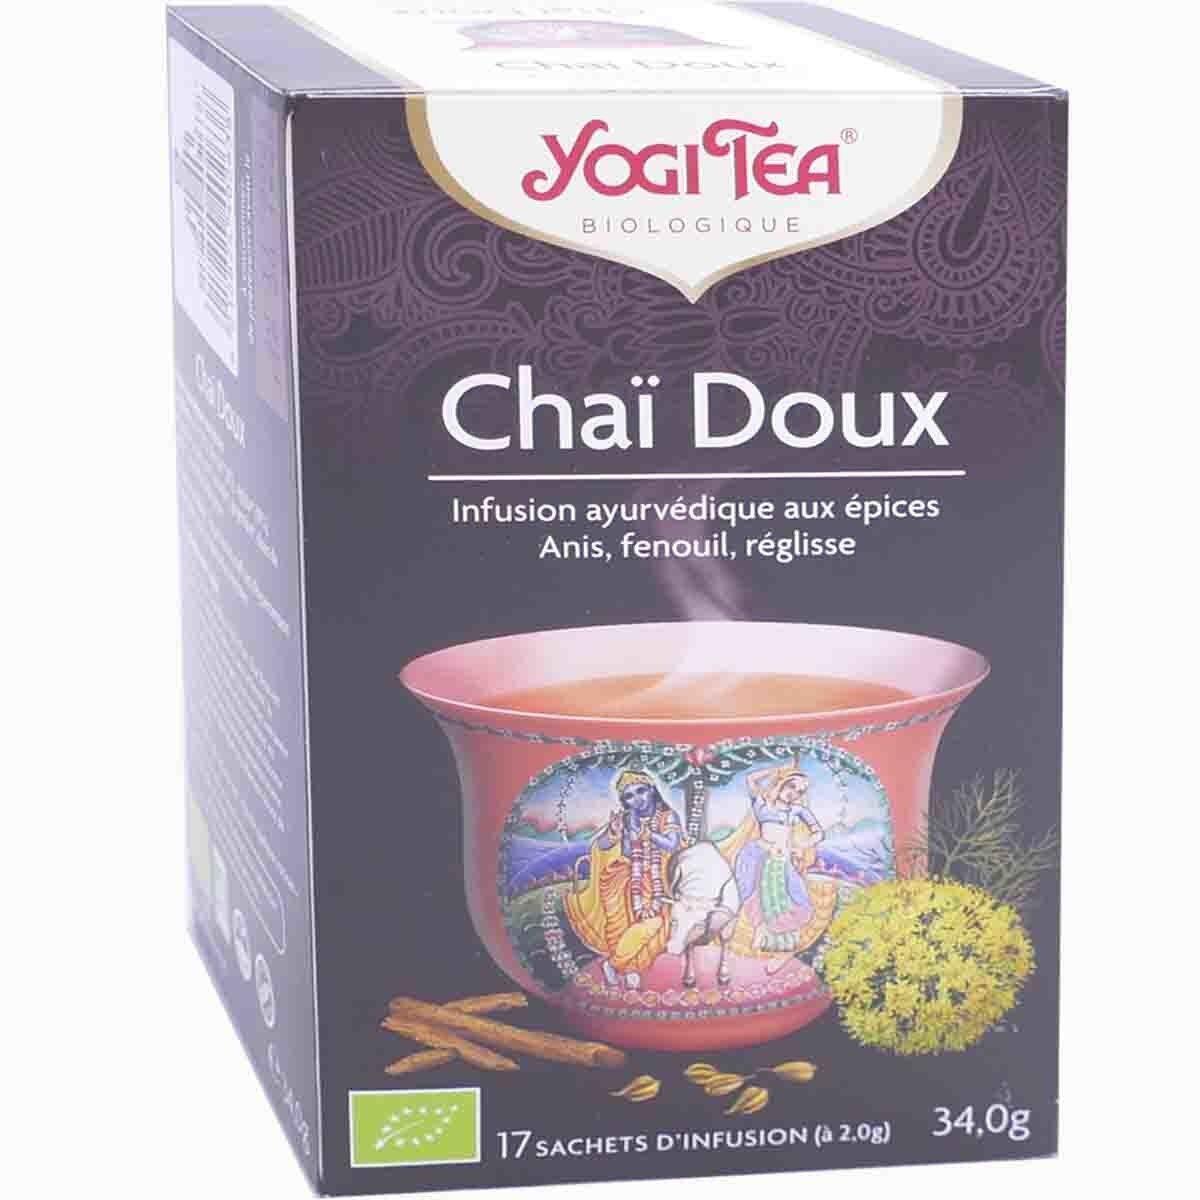 Yogi tea chai doux infusion 17 sachets 2.0 g